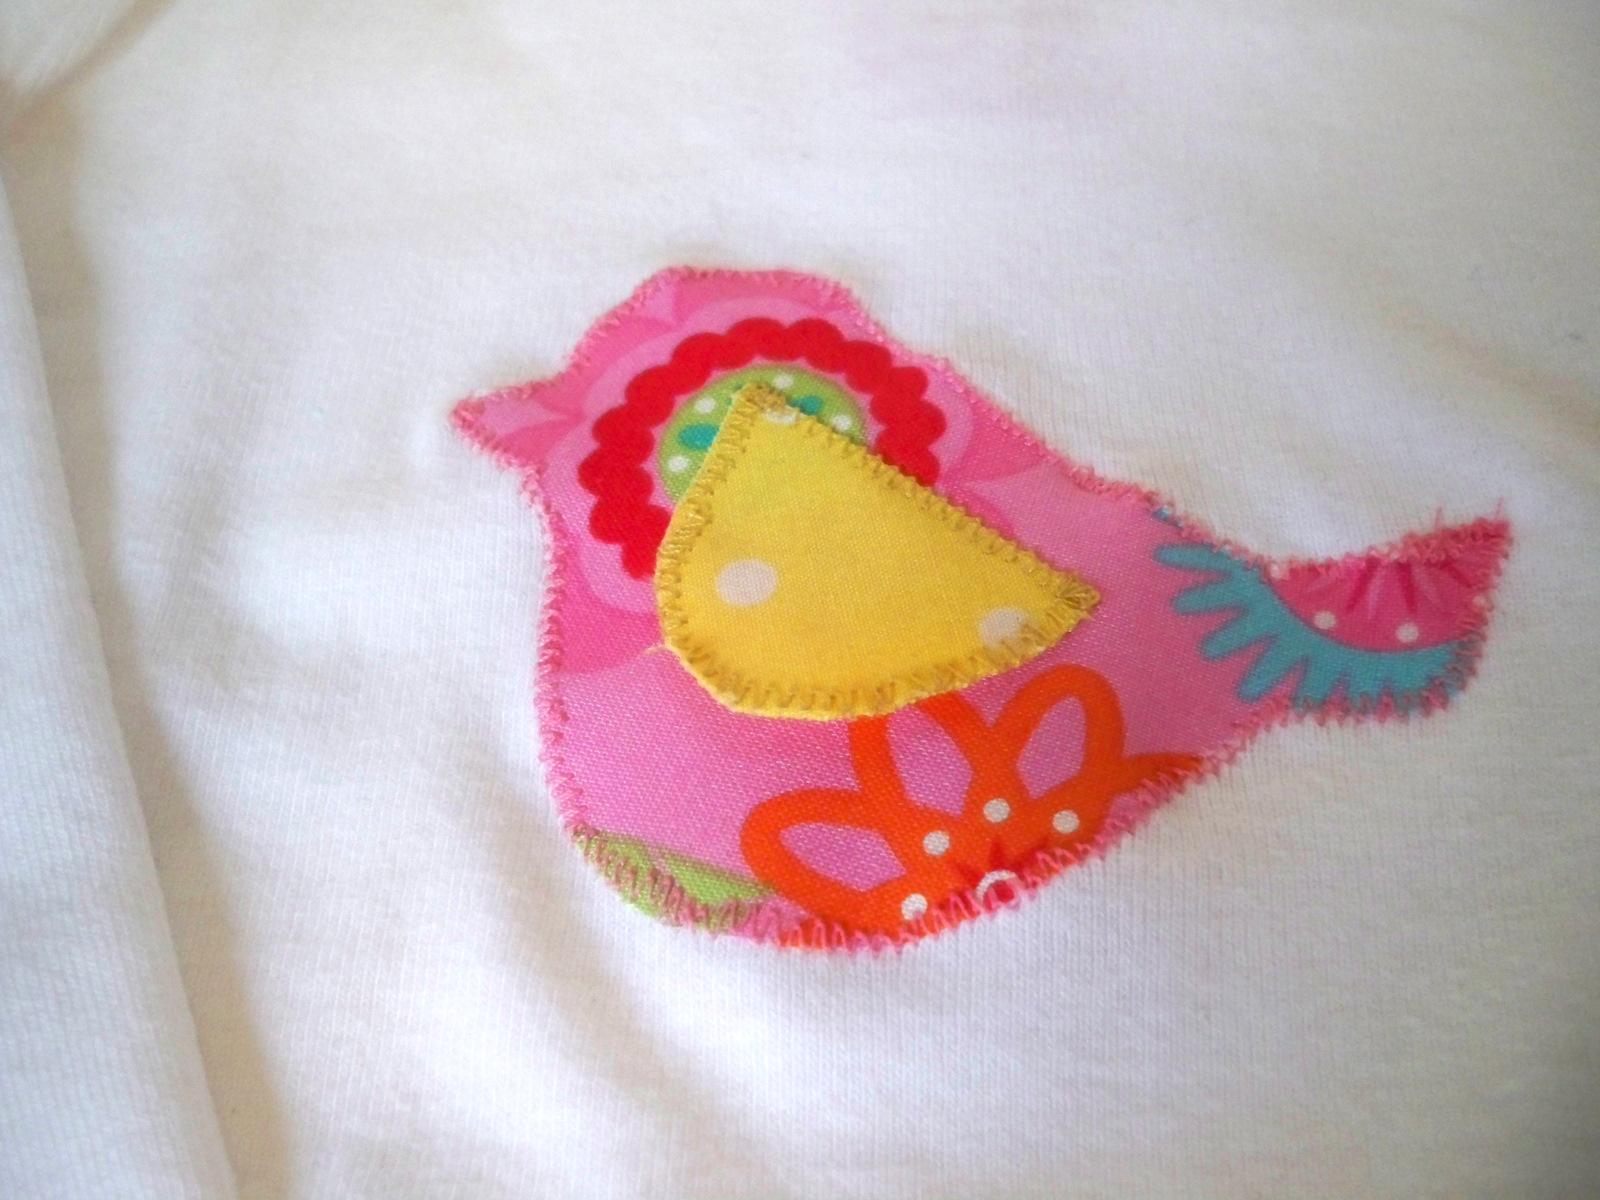 Cute Ladybugs Embroidery Applique - SewWithLisaB.com Children's